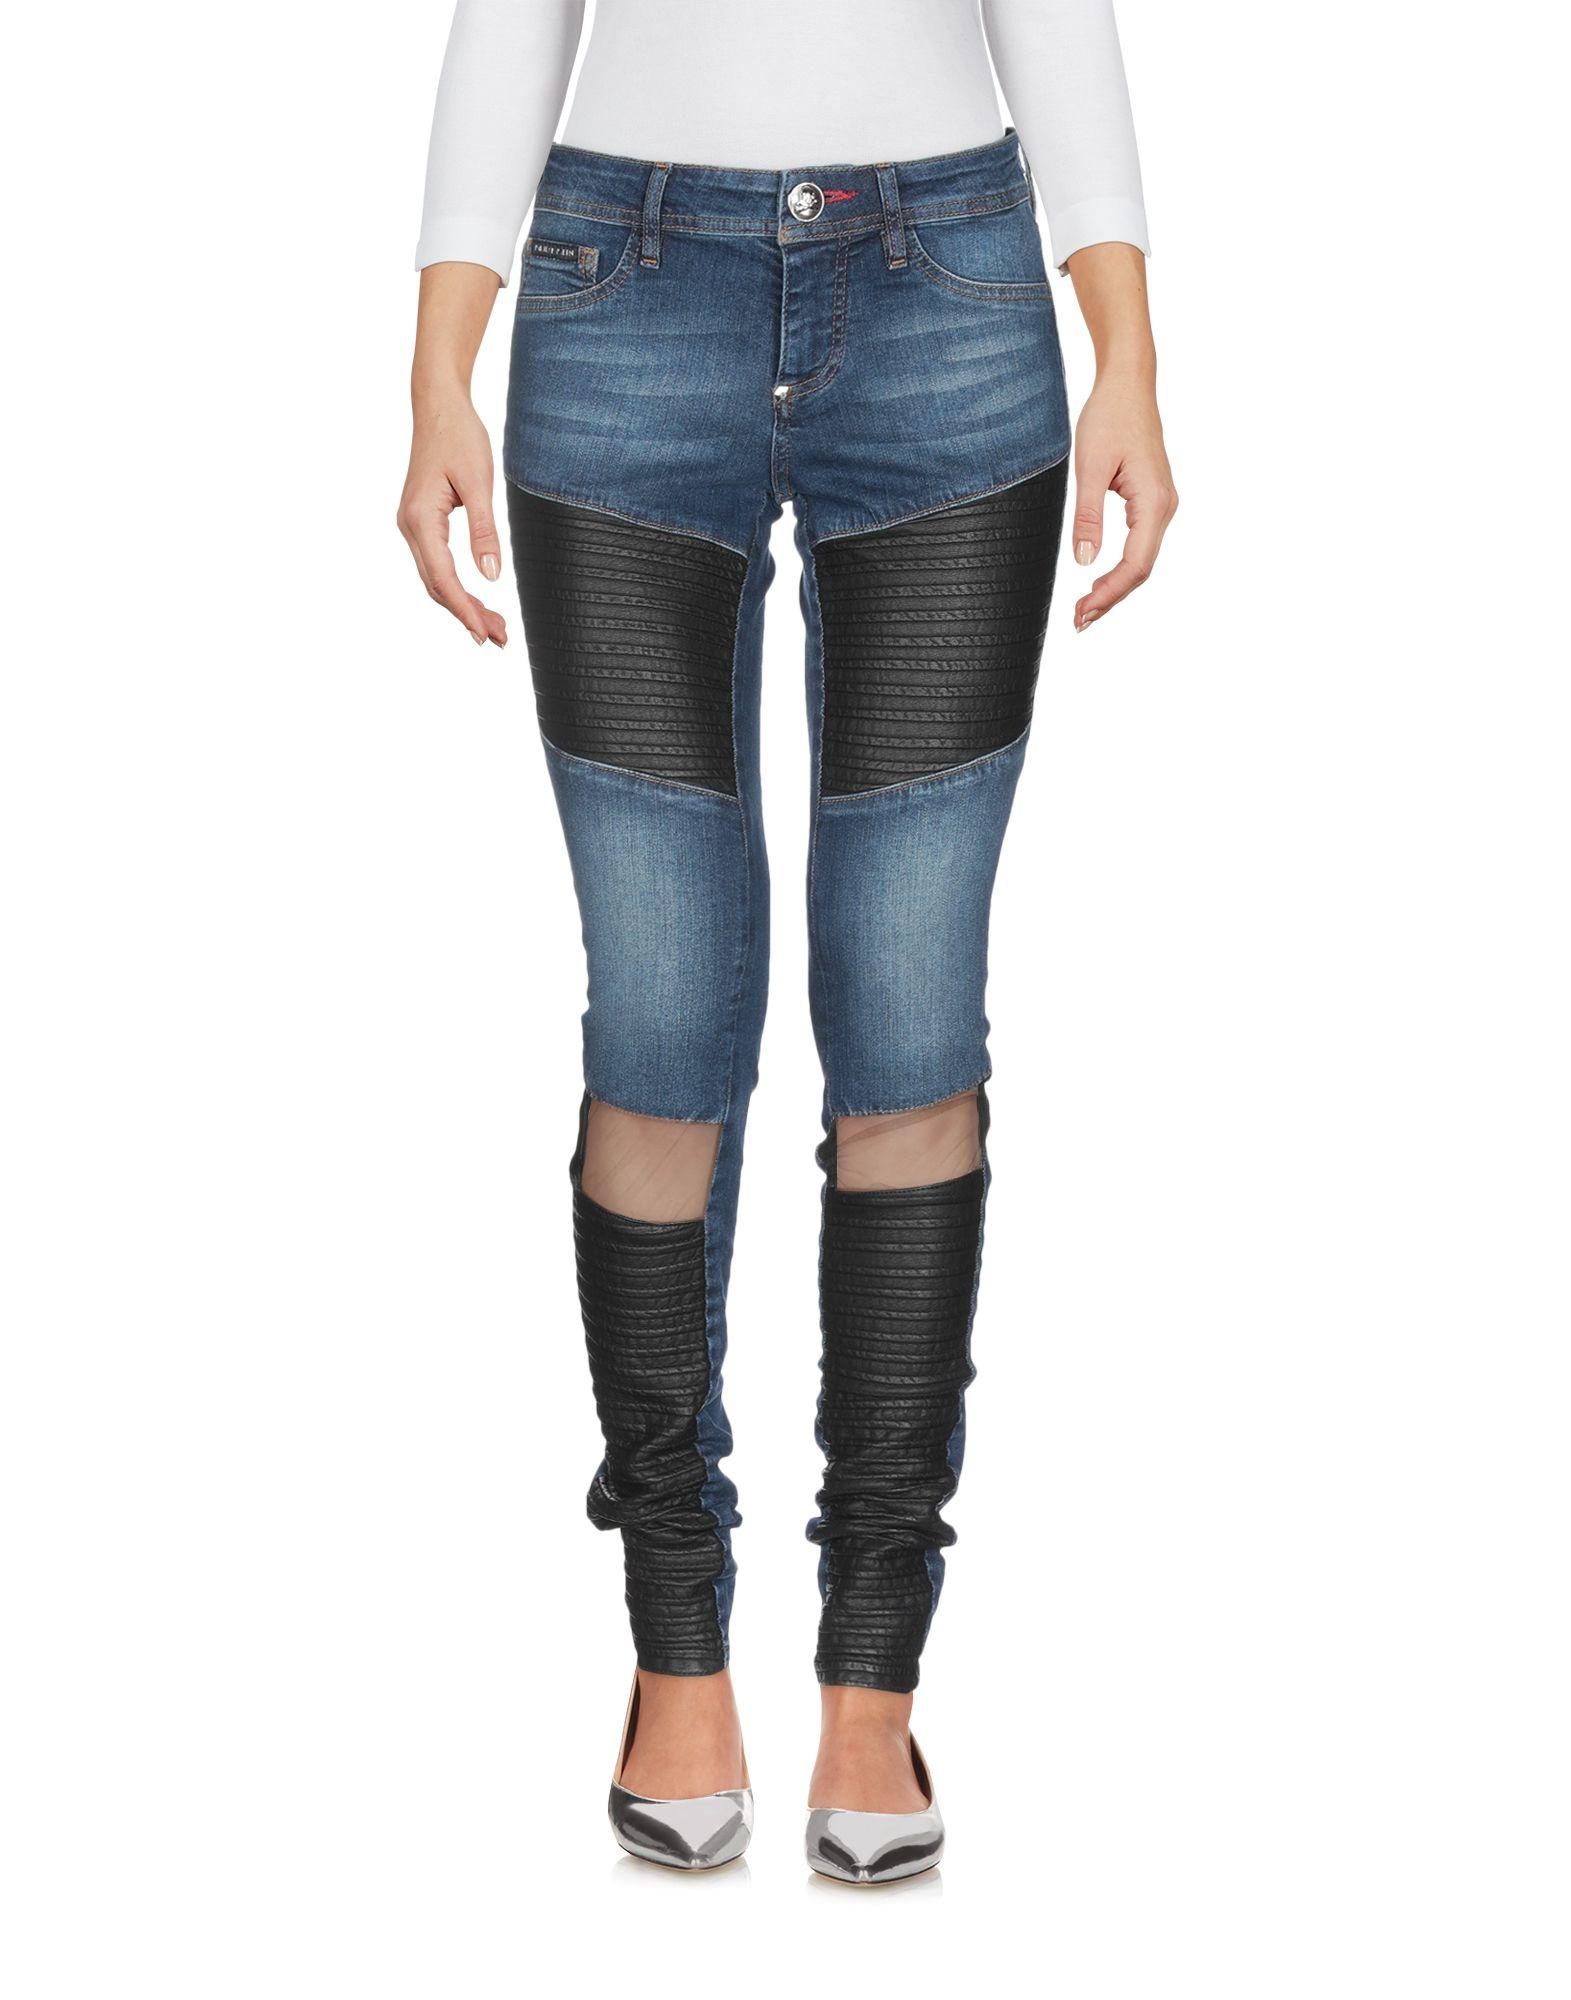 Pantaloni Jeans Philipp Plein donna - - - 42726188HI a53